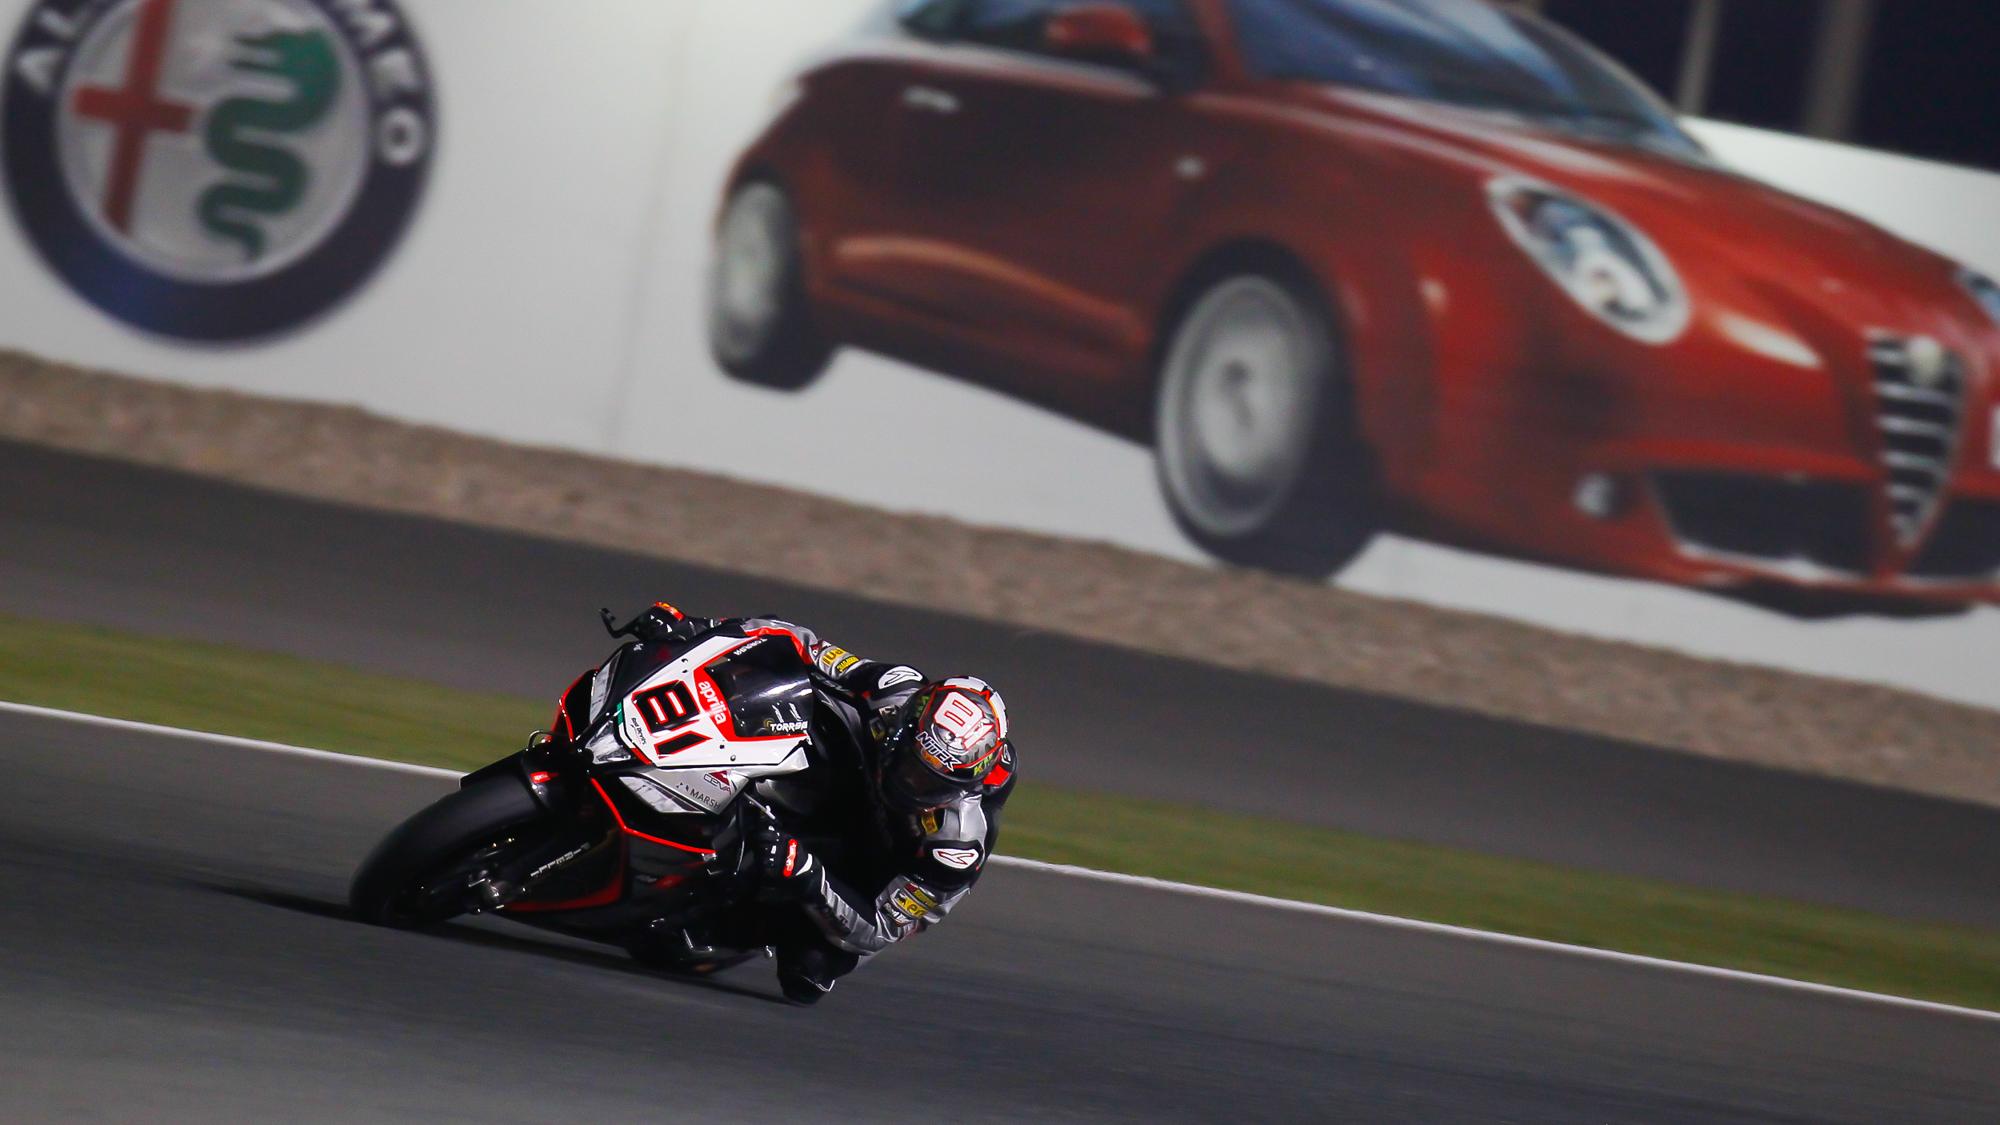 WSBK 2015: Qatar race one results